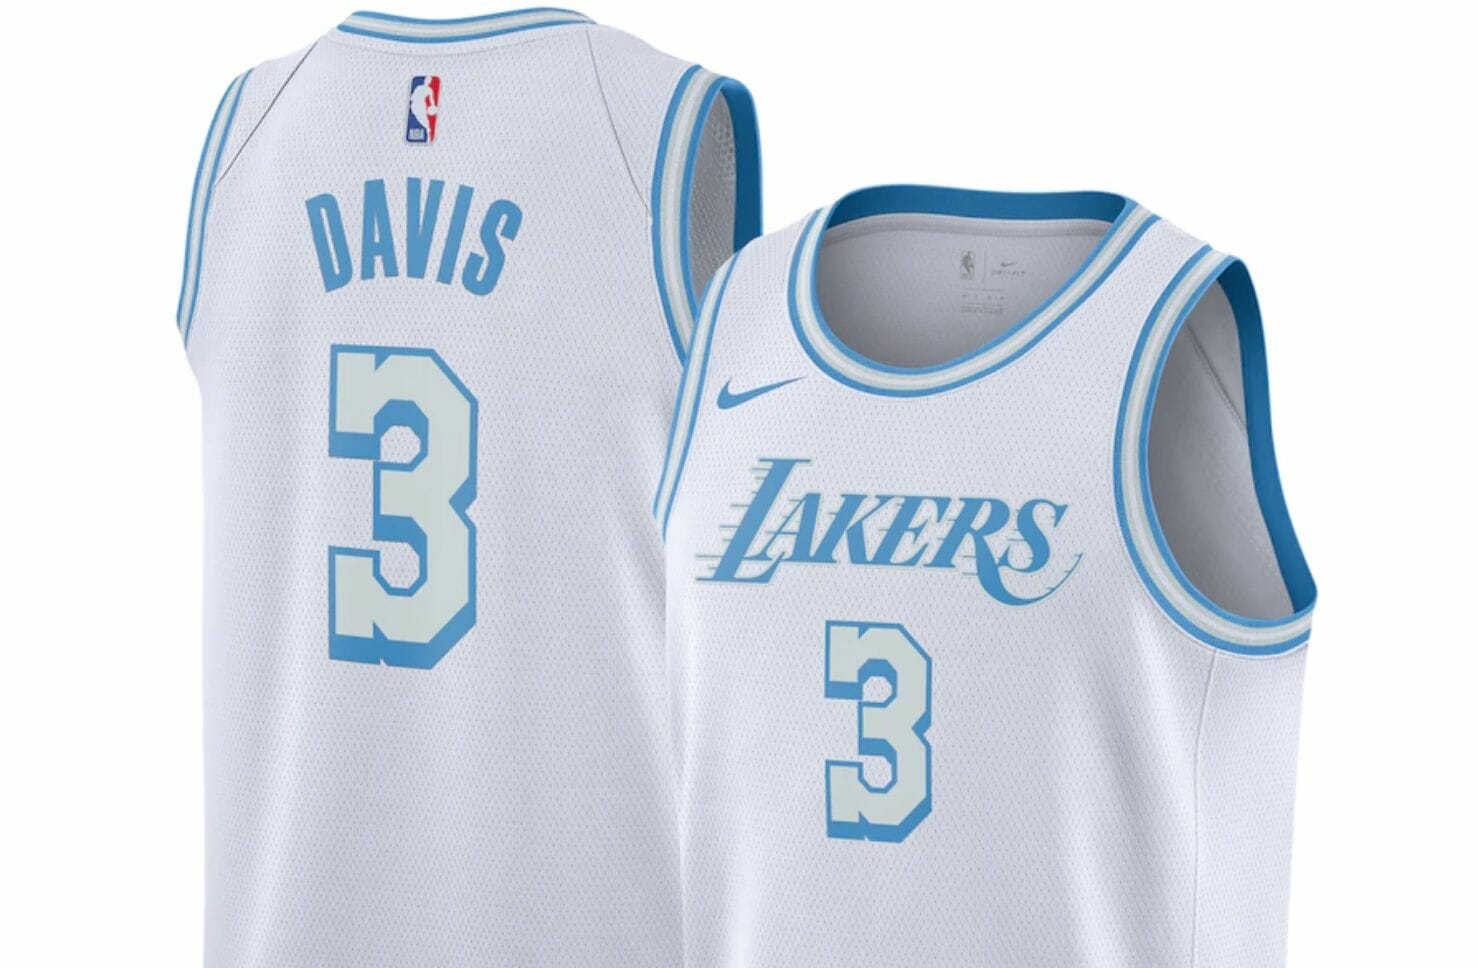 Elgin Baylor Designs Lakers Lore Series Jersey For 2020-21 Nike ...